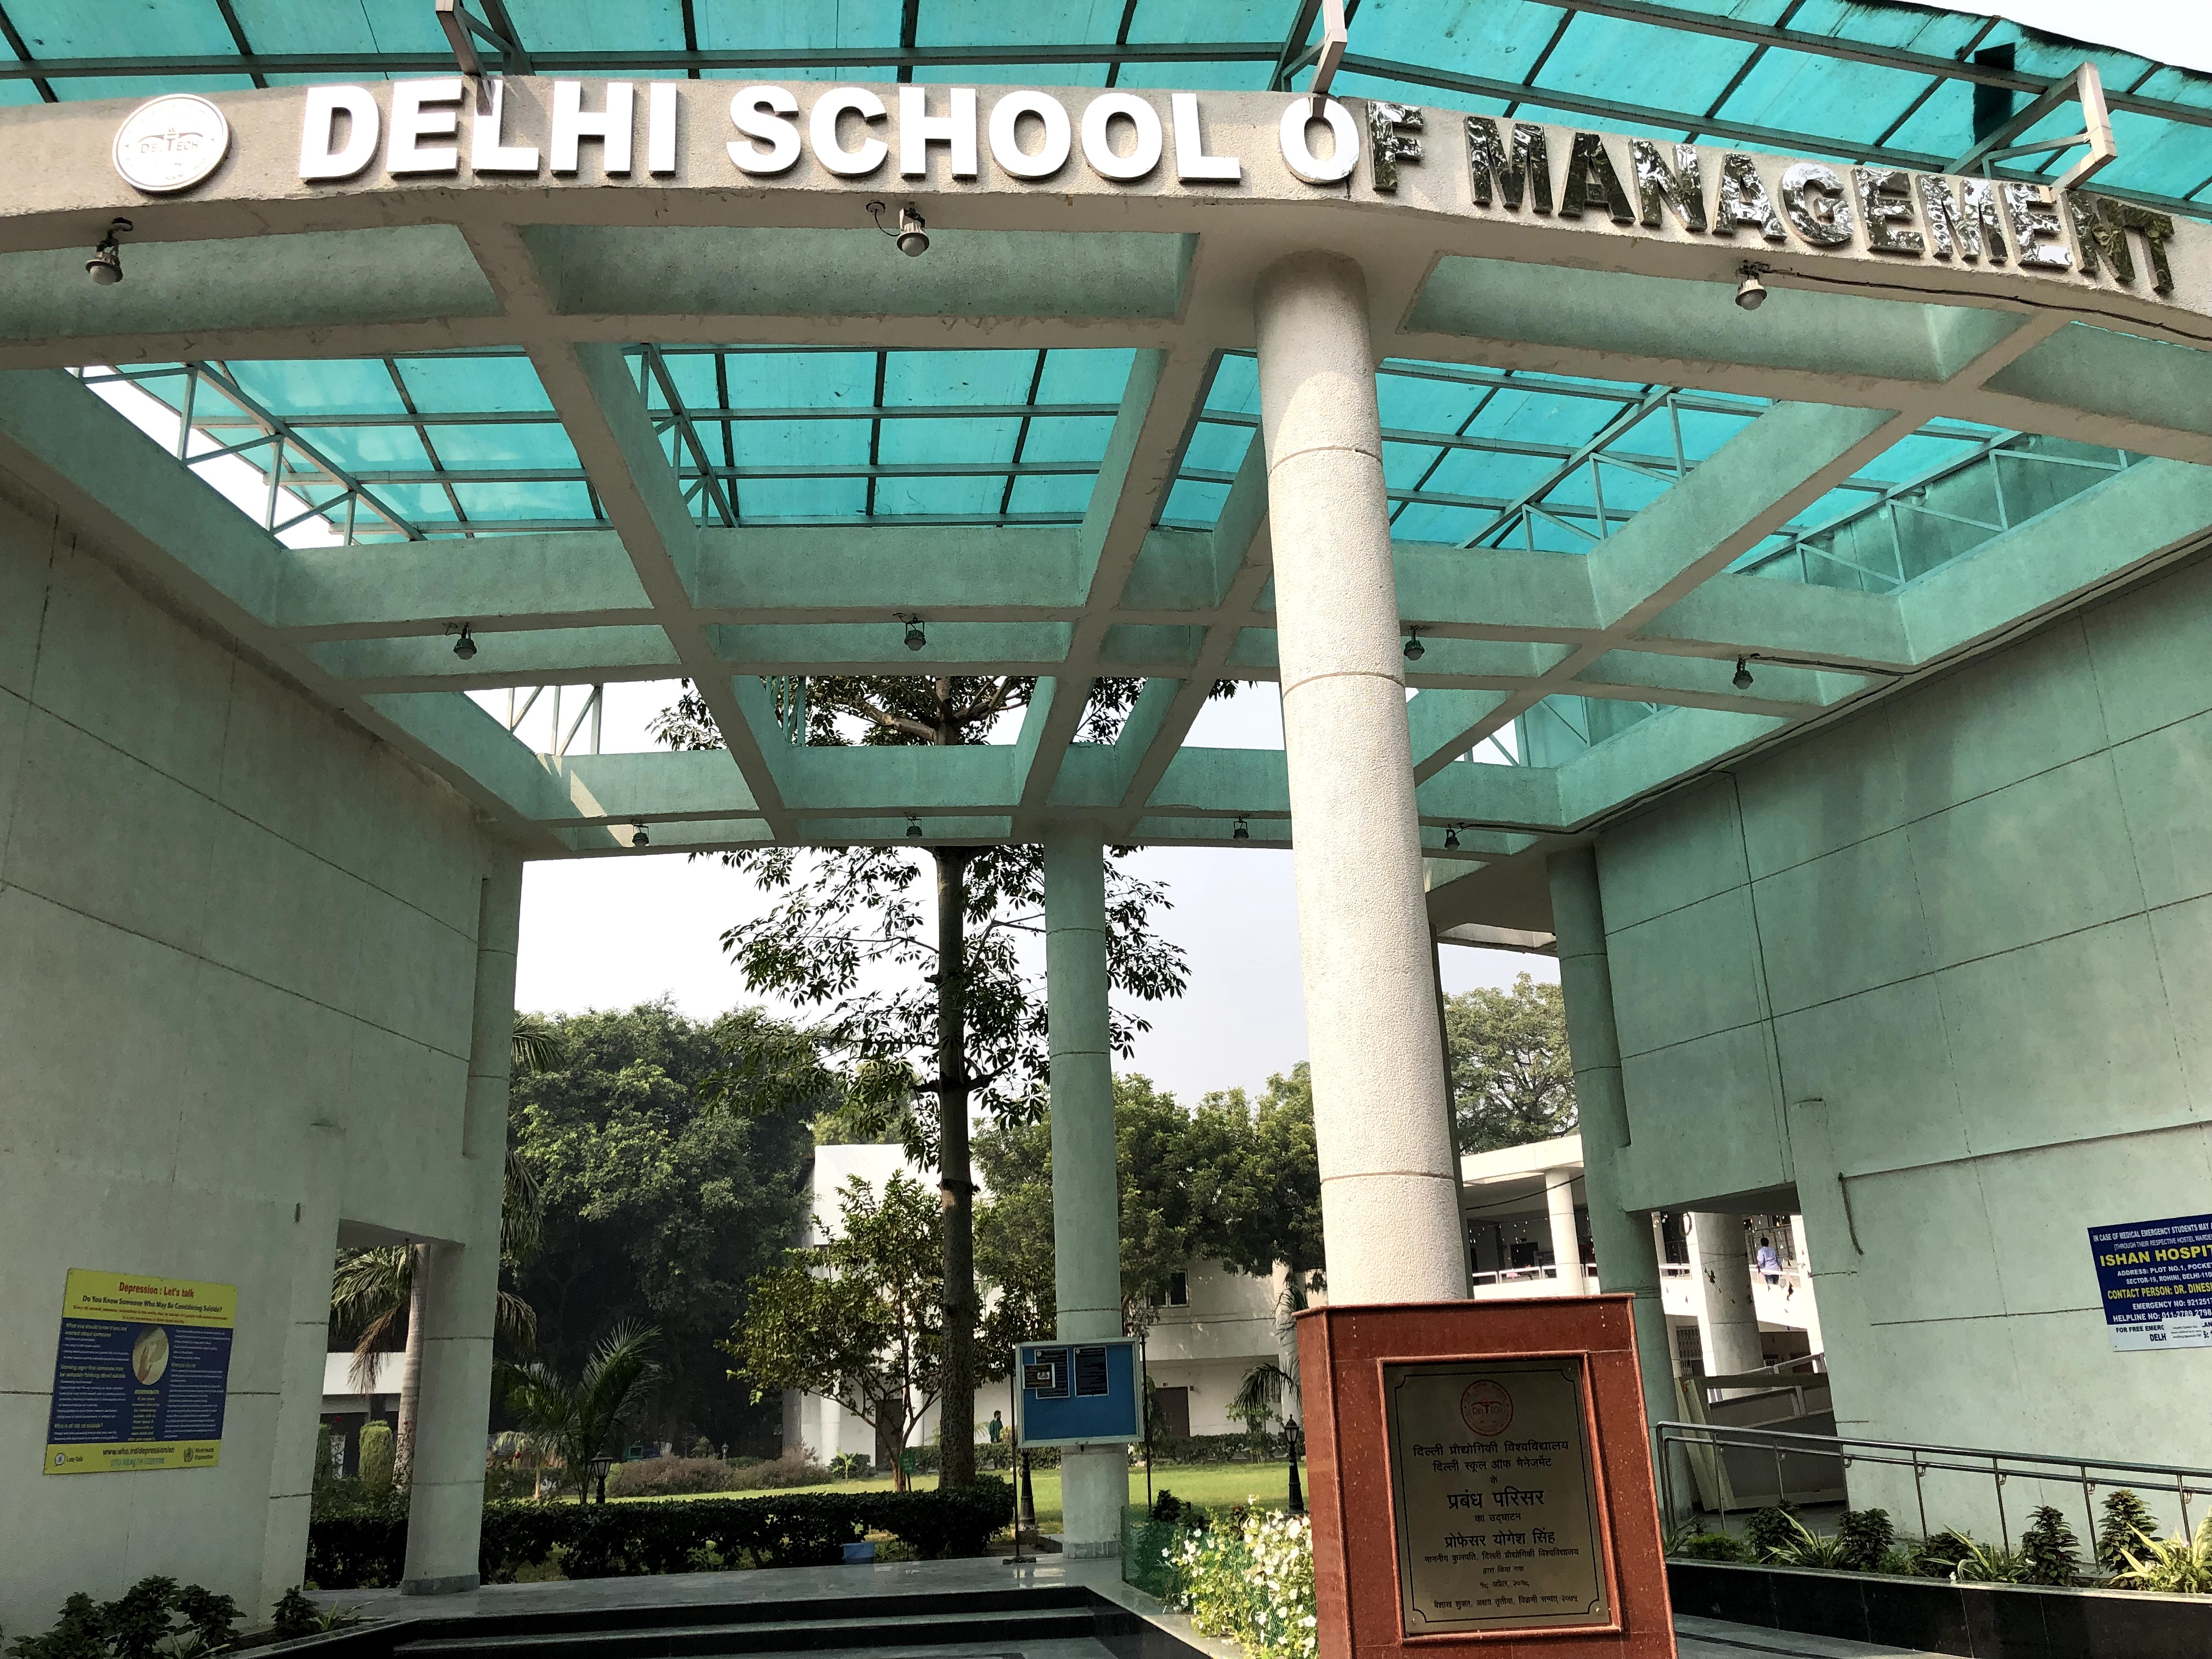 Delhi School of Management - Wikipedia